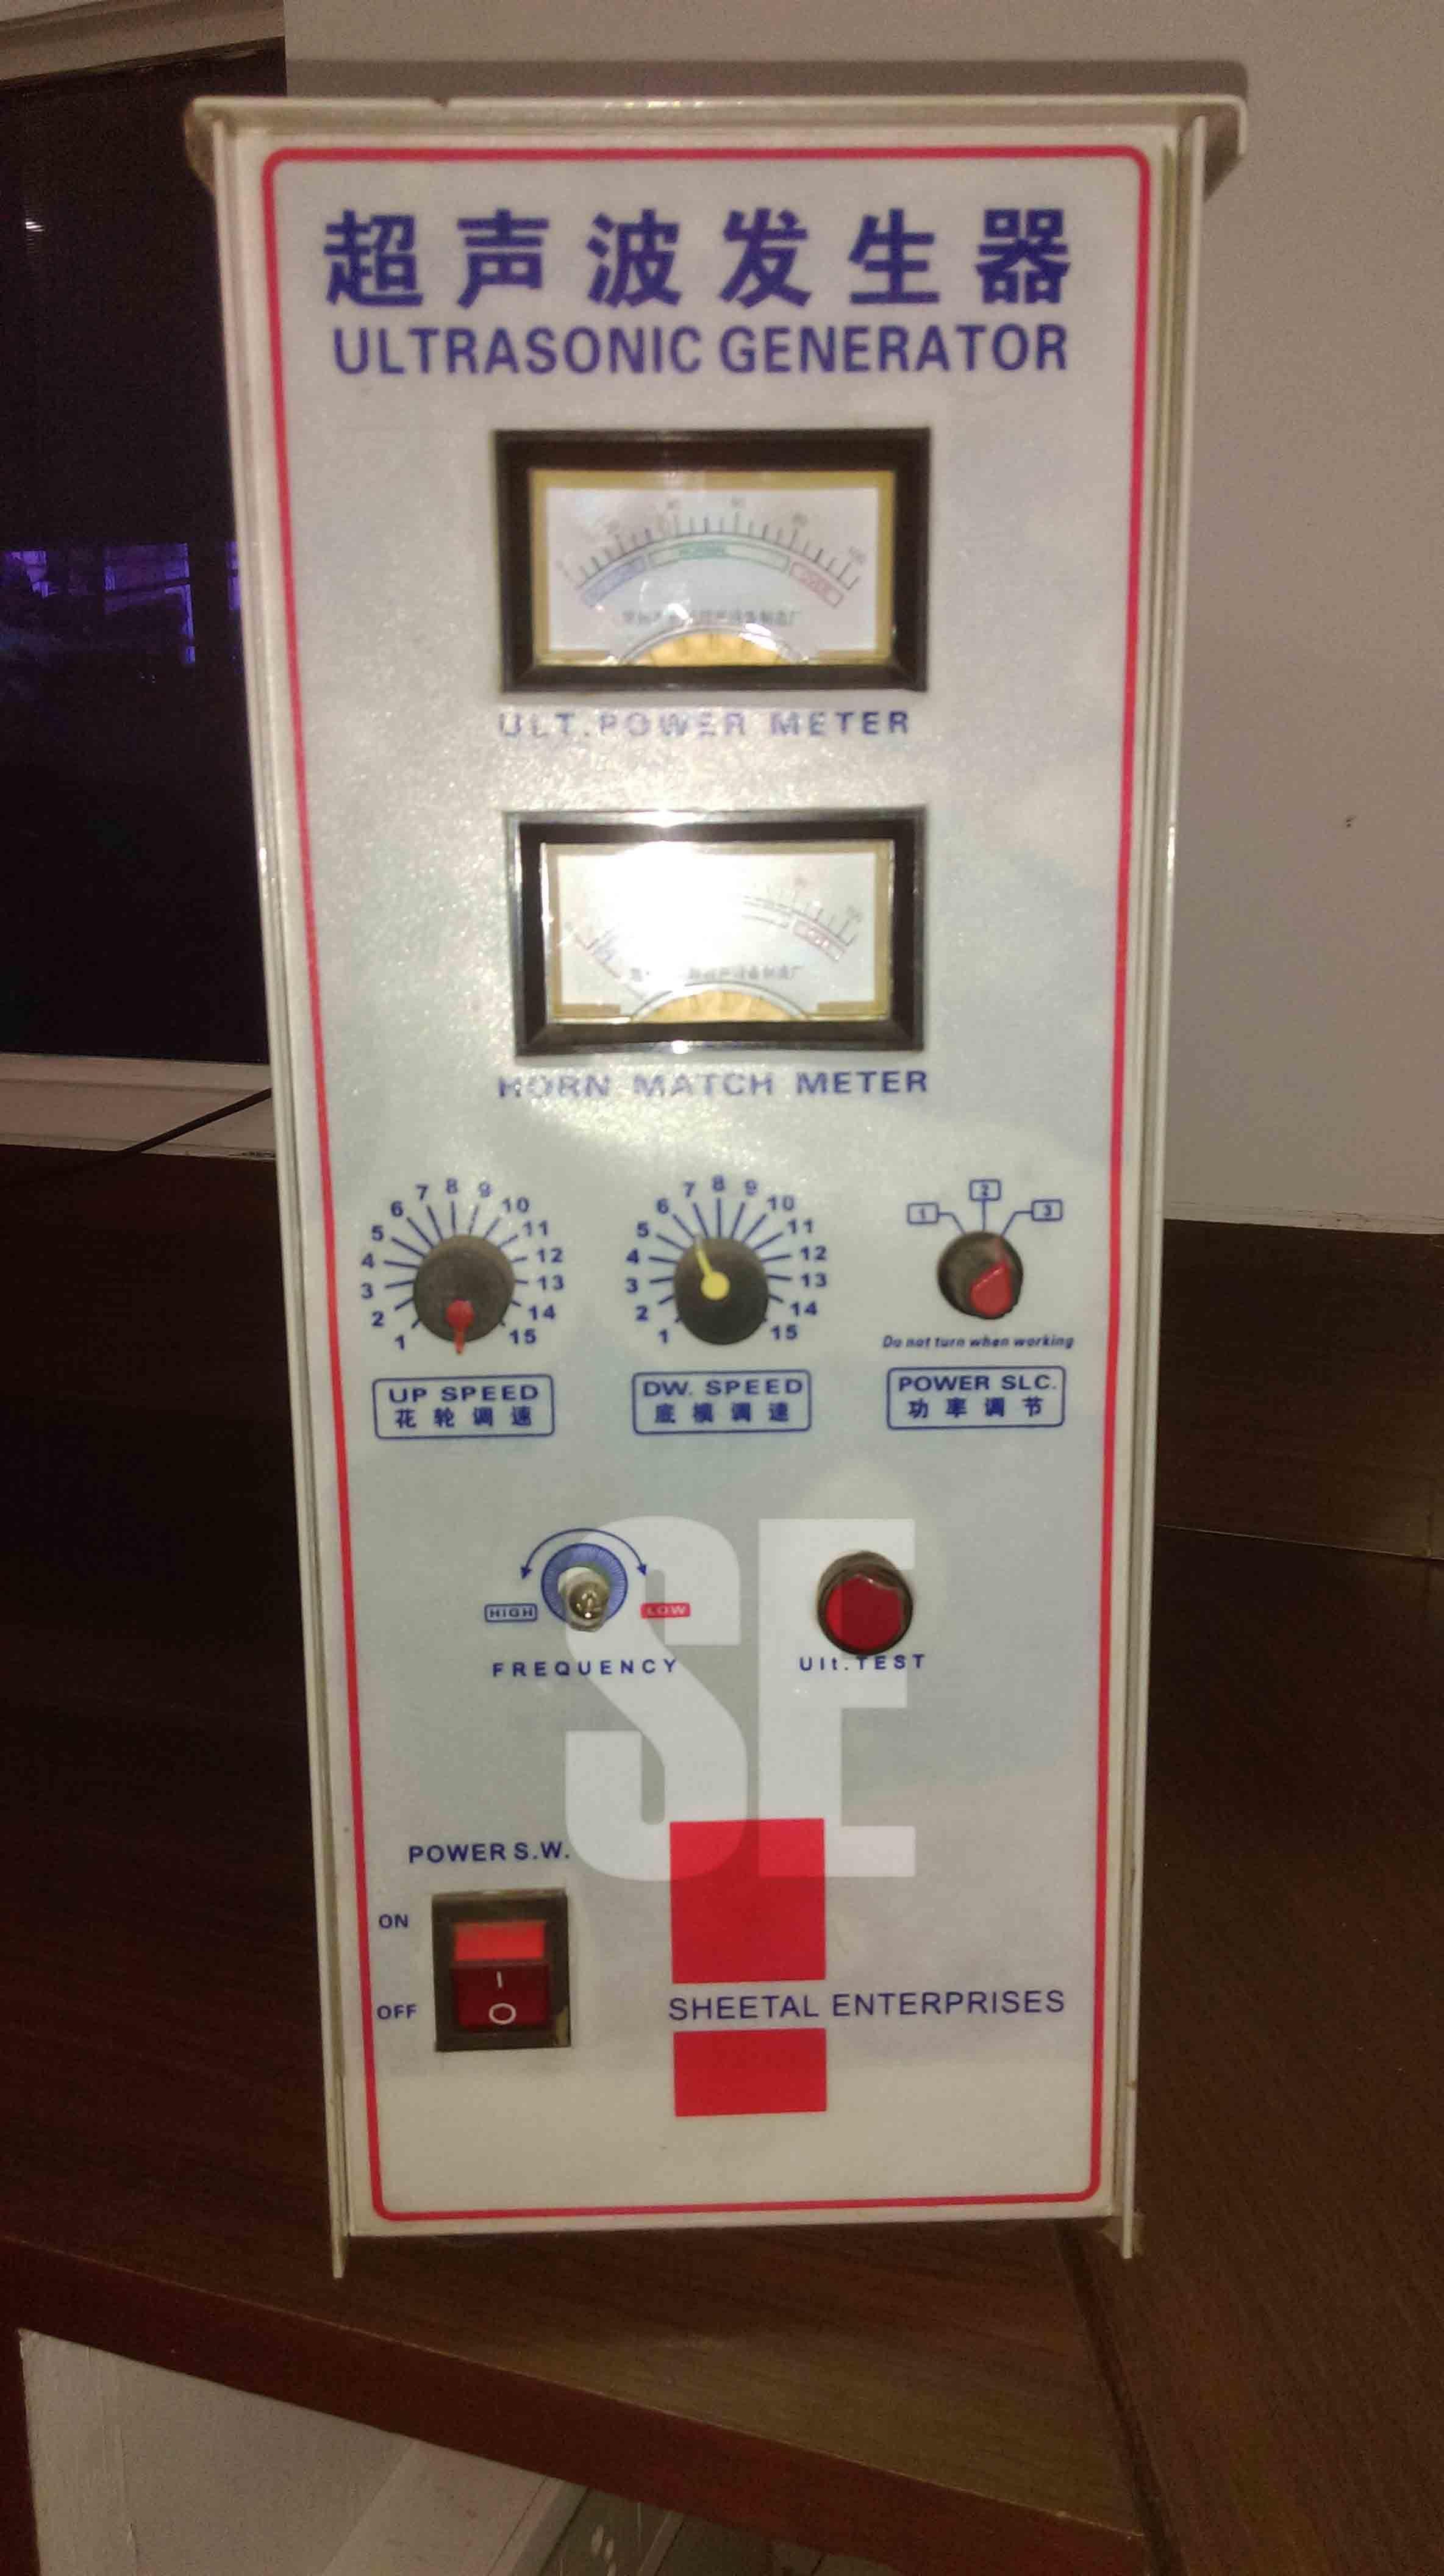 Ultrasonic Generator Box (20Khz)